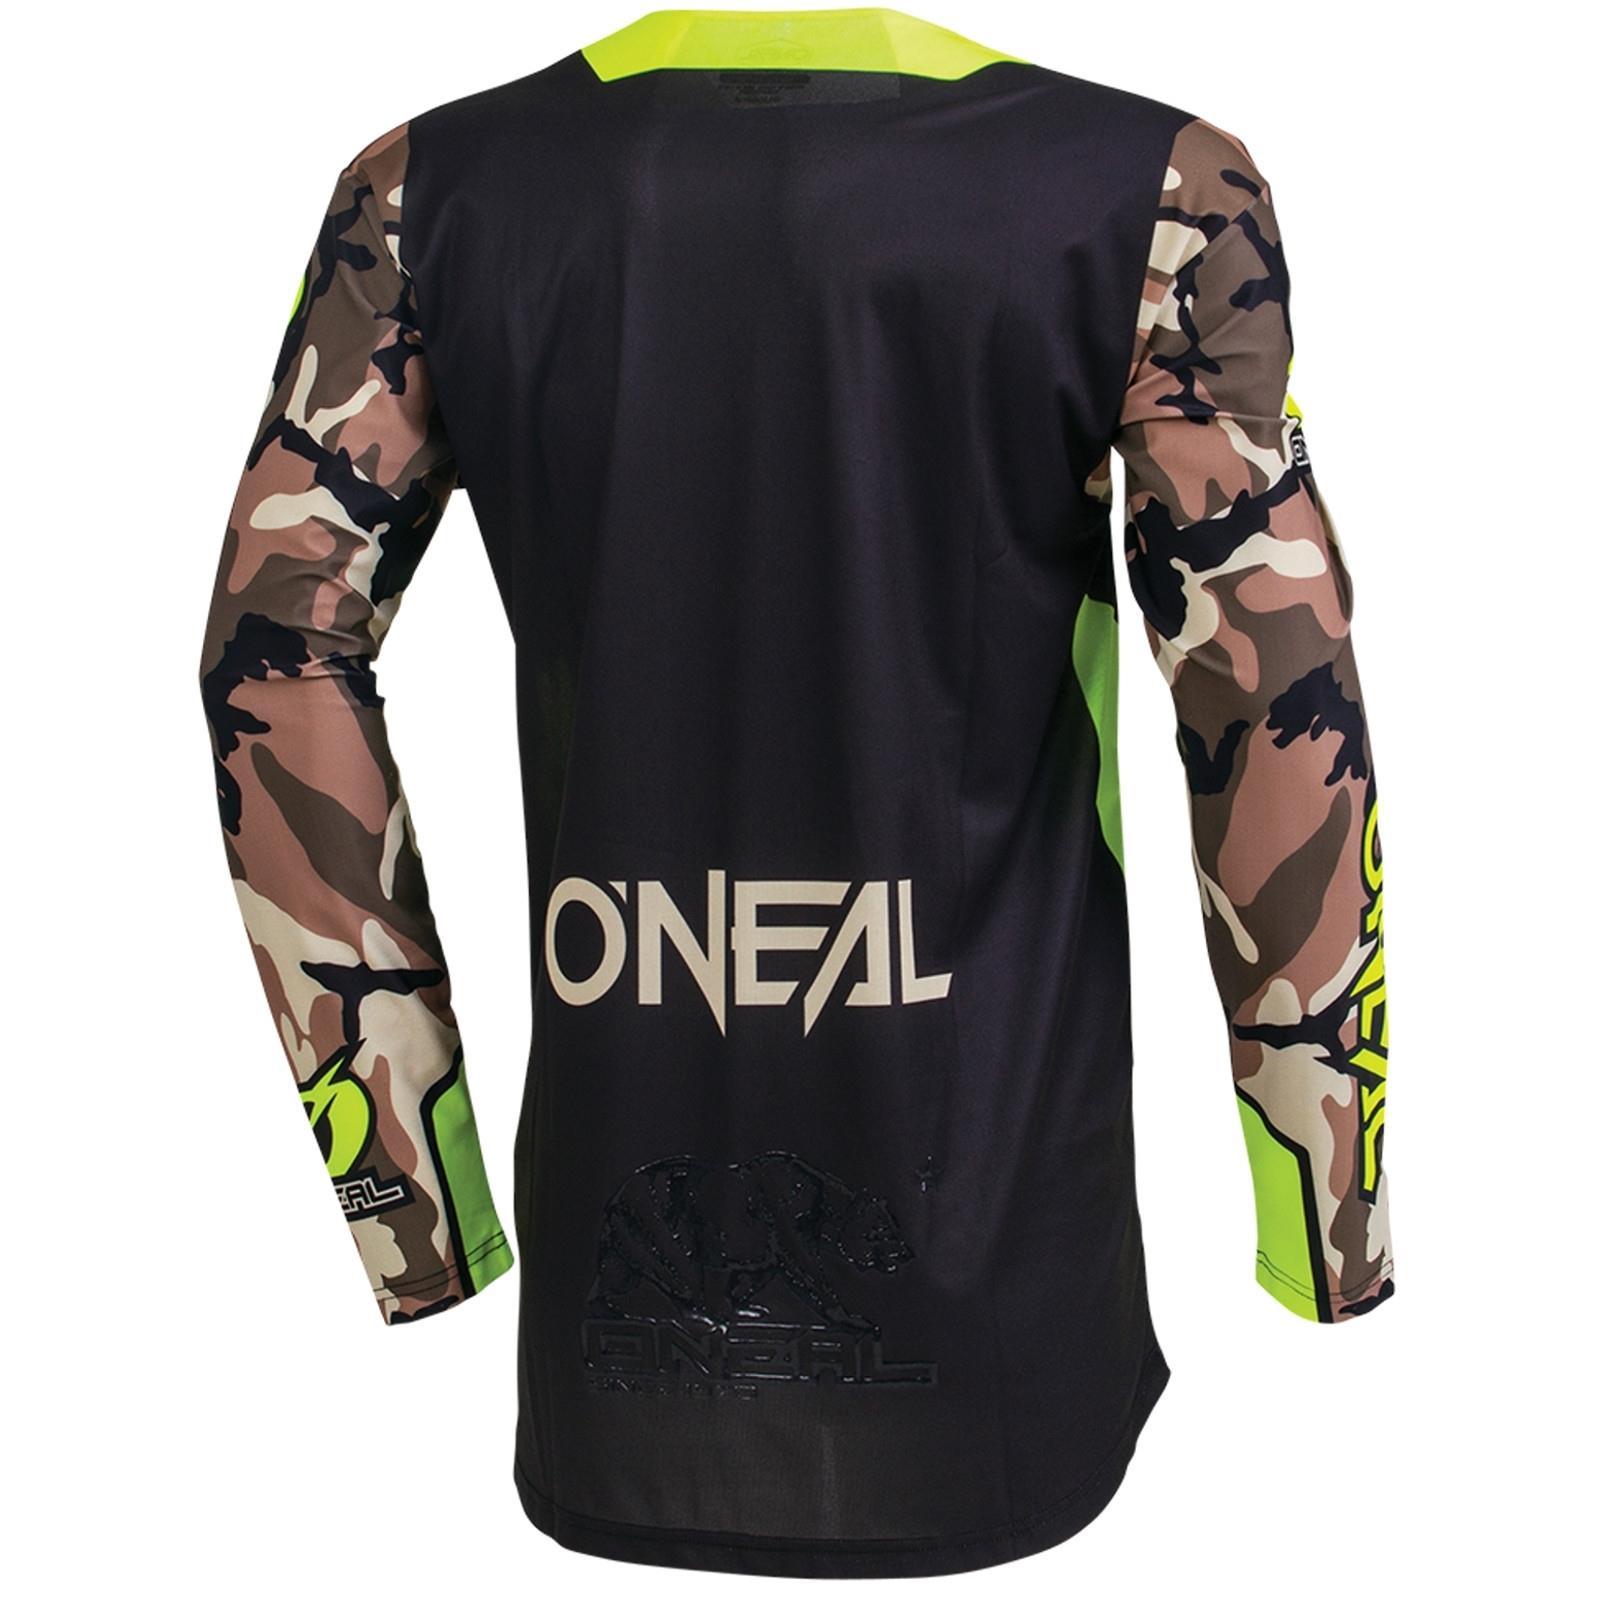 O-039-Neal-elemento-Mayhem-JERSEY-Racewear-Motocross-Maglia-MX-DH-FR-MTB-MOUNTAIN-BIKE miniatura 54